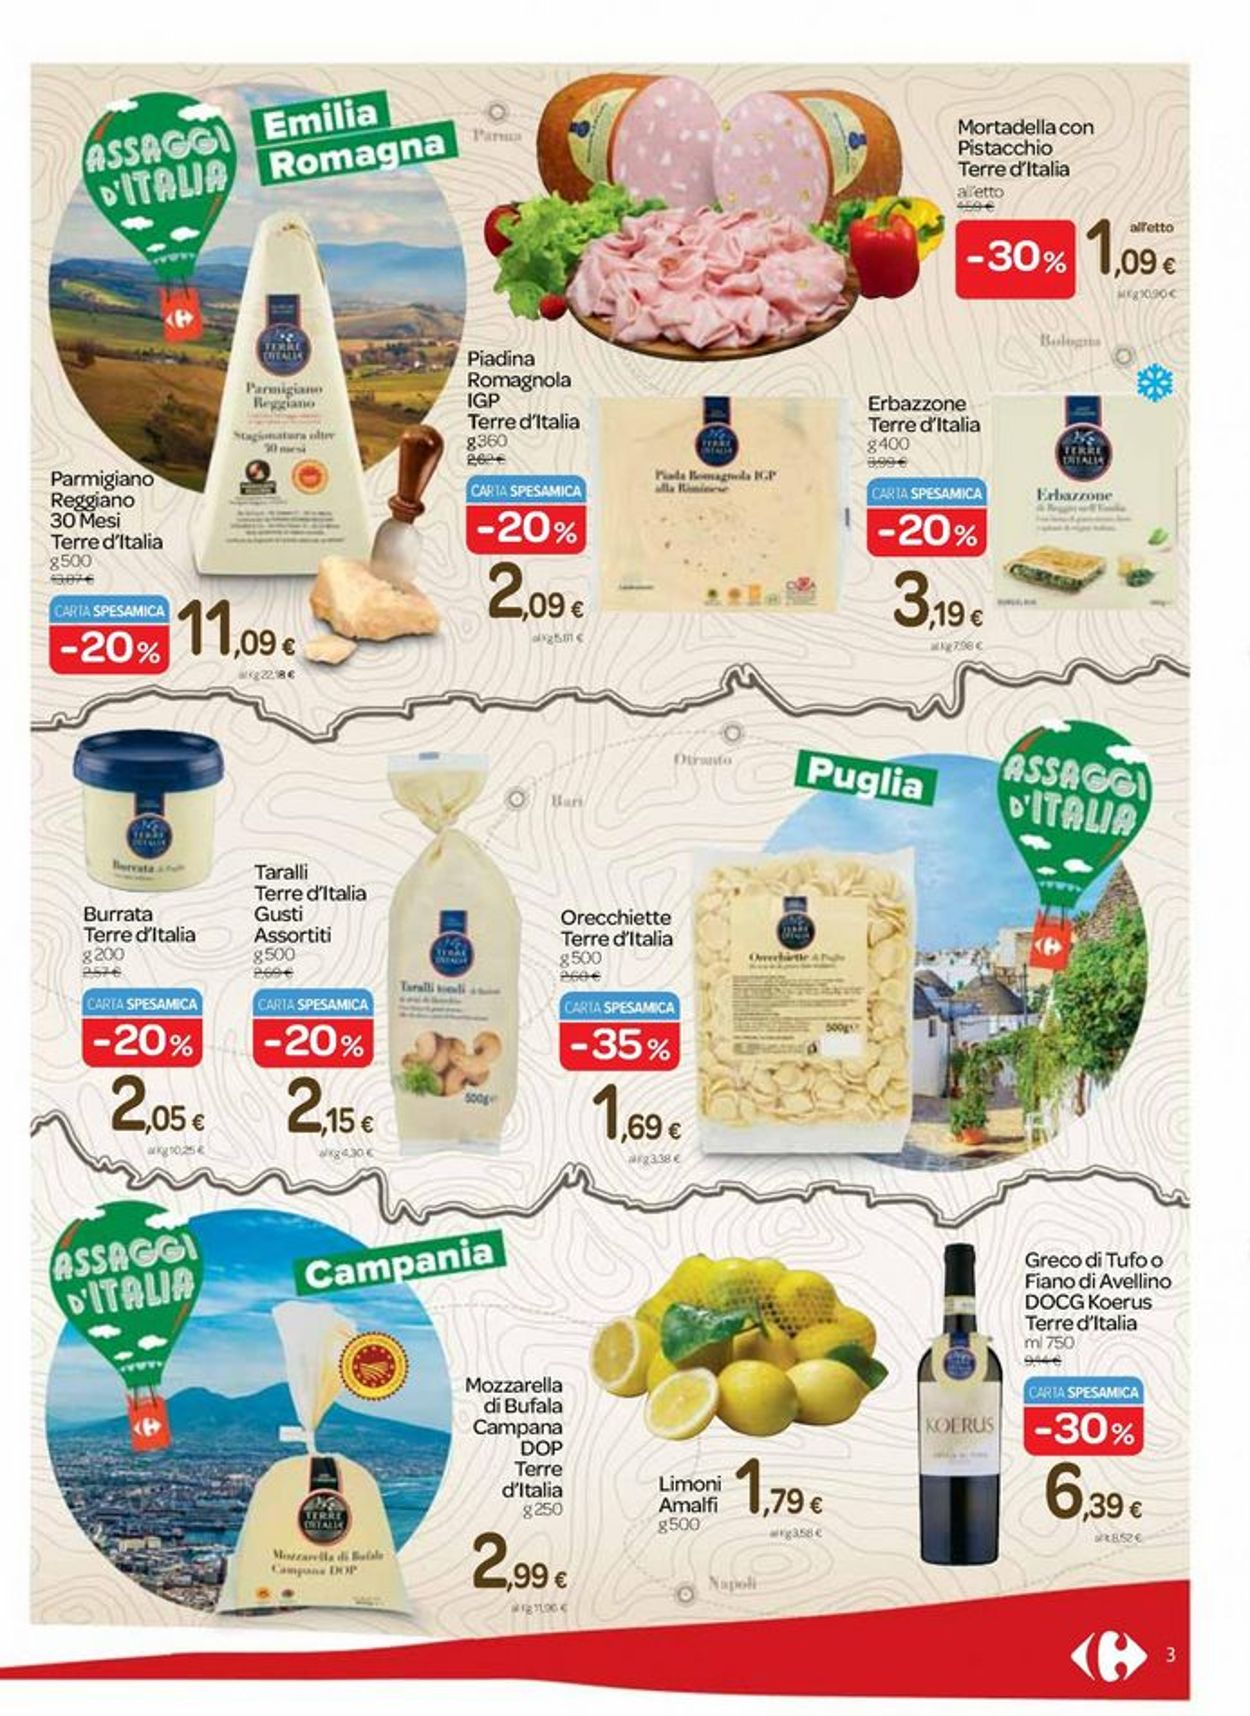 Volantino Carrefour - Offerte 17/06-29/06/2021 (Pagina 3)